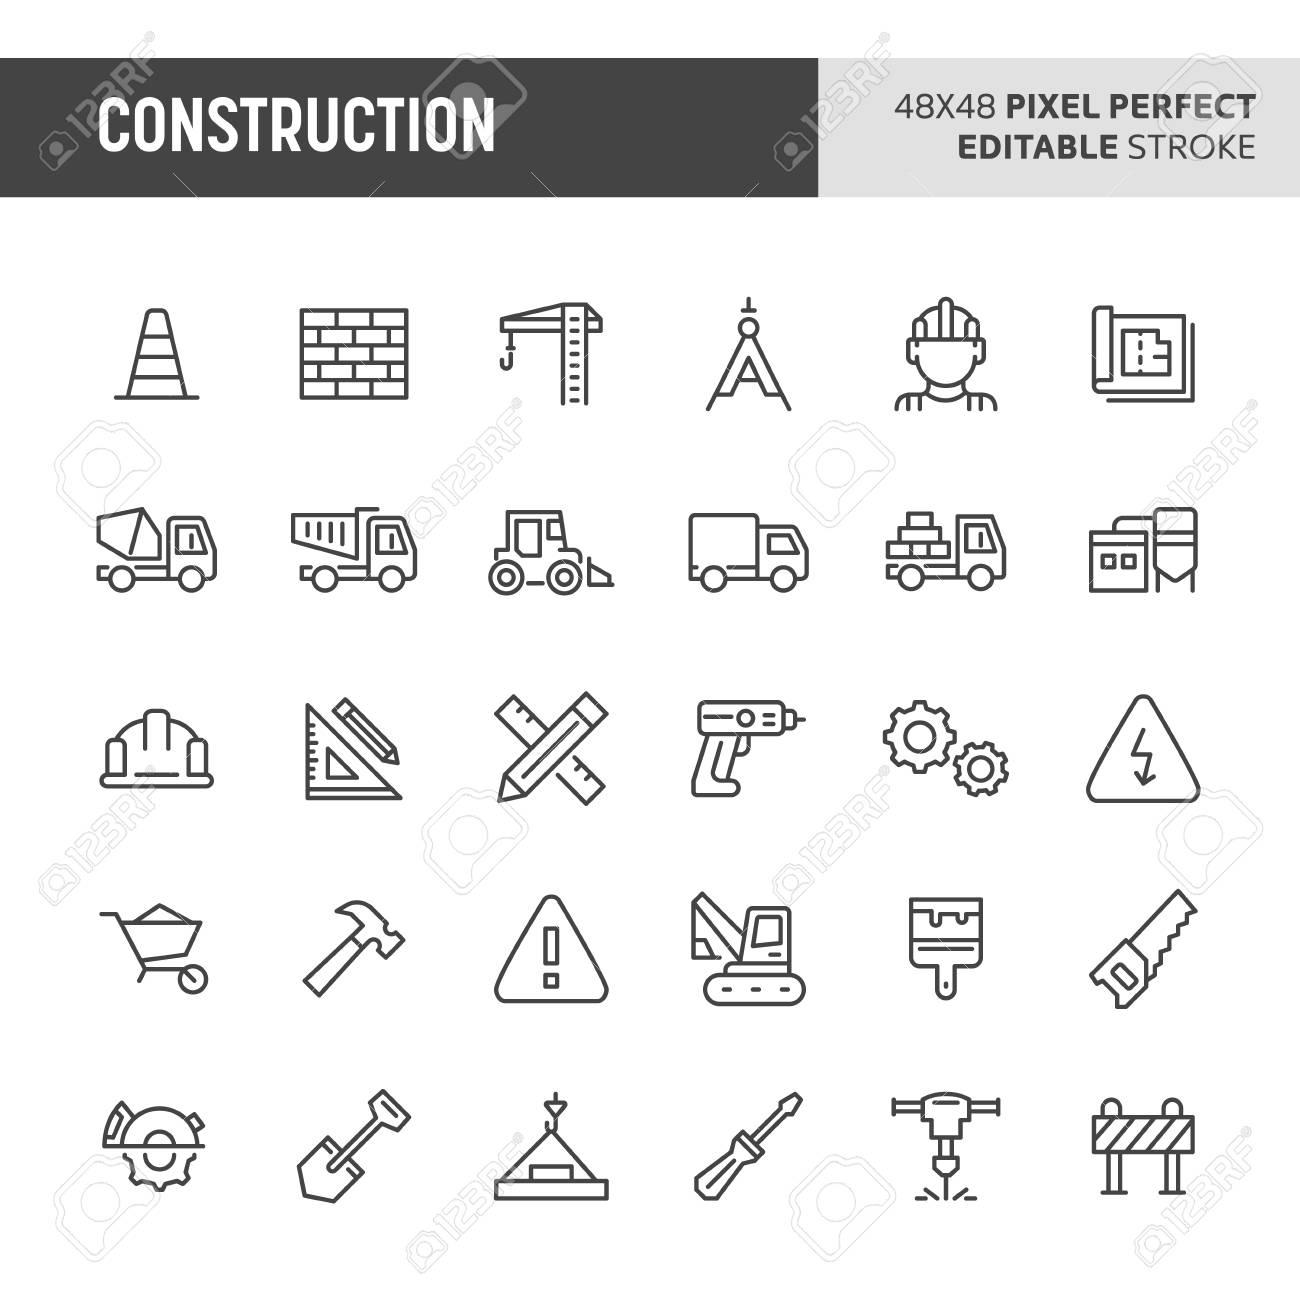 Construction Crane Symbol Icon Vector Illustration Graphic Design Royalty  Free Cliparts, Vectors, And Stock Illustration. Image 94437845.